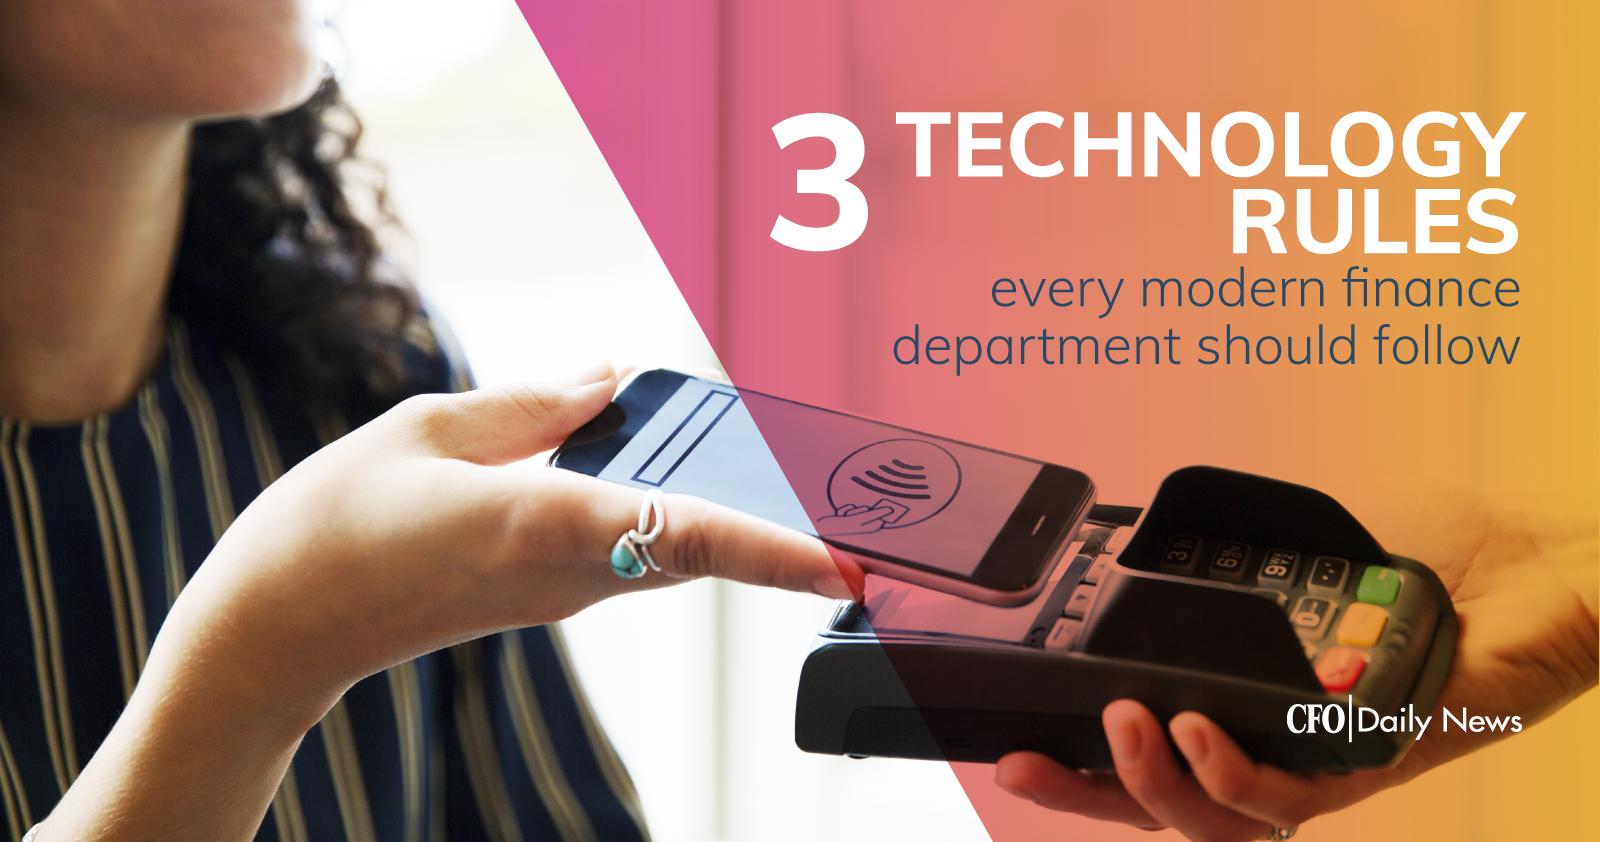 3 technology rules every modern finance department should follow